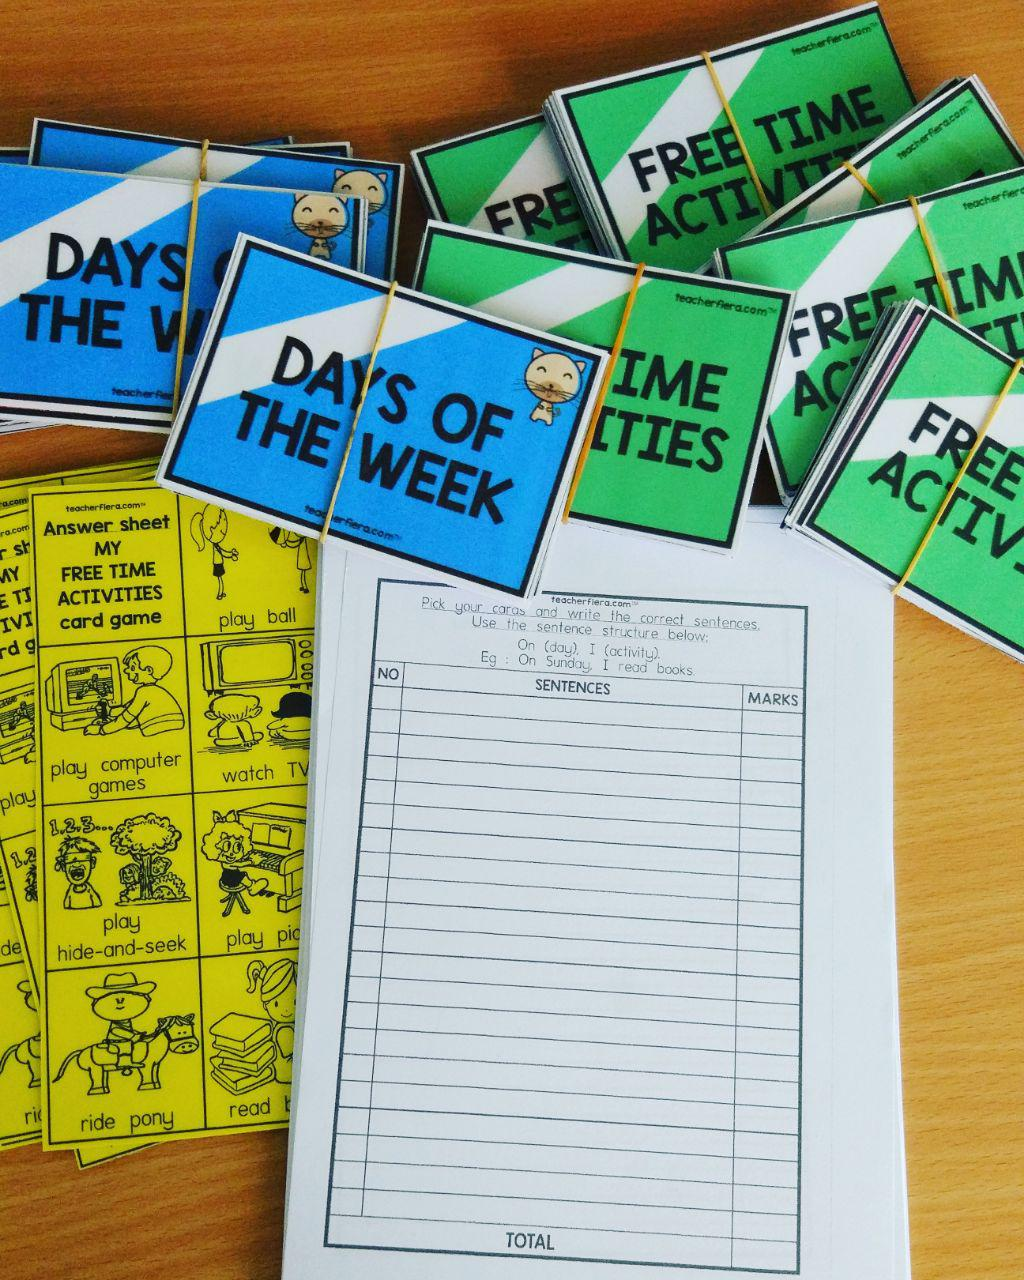 Teacherfiera Year 2 Unit 5 Card Game For